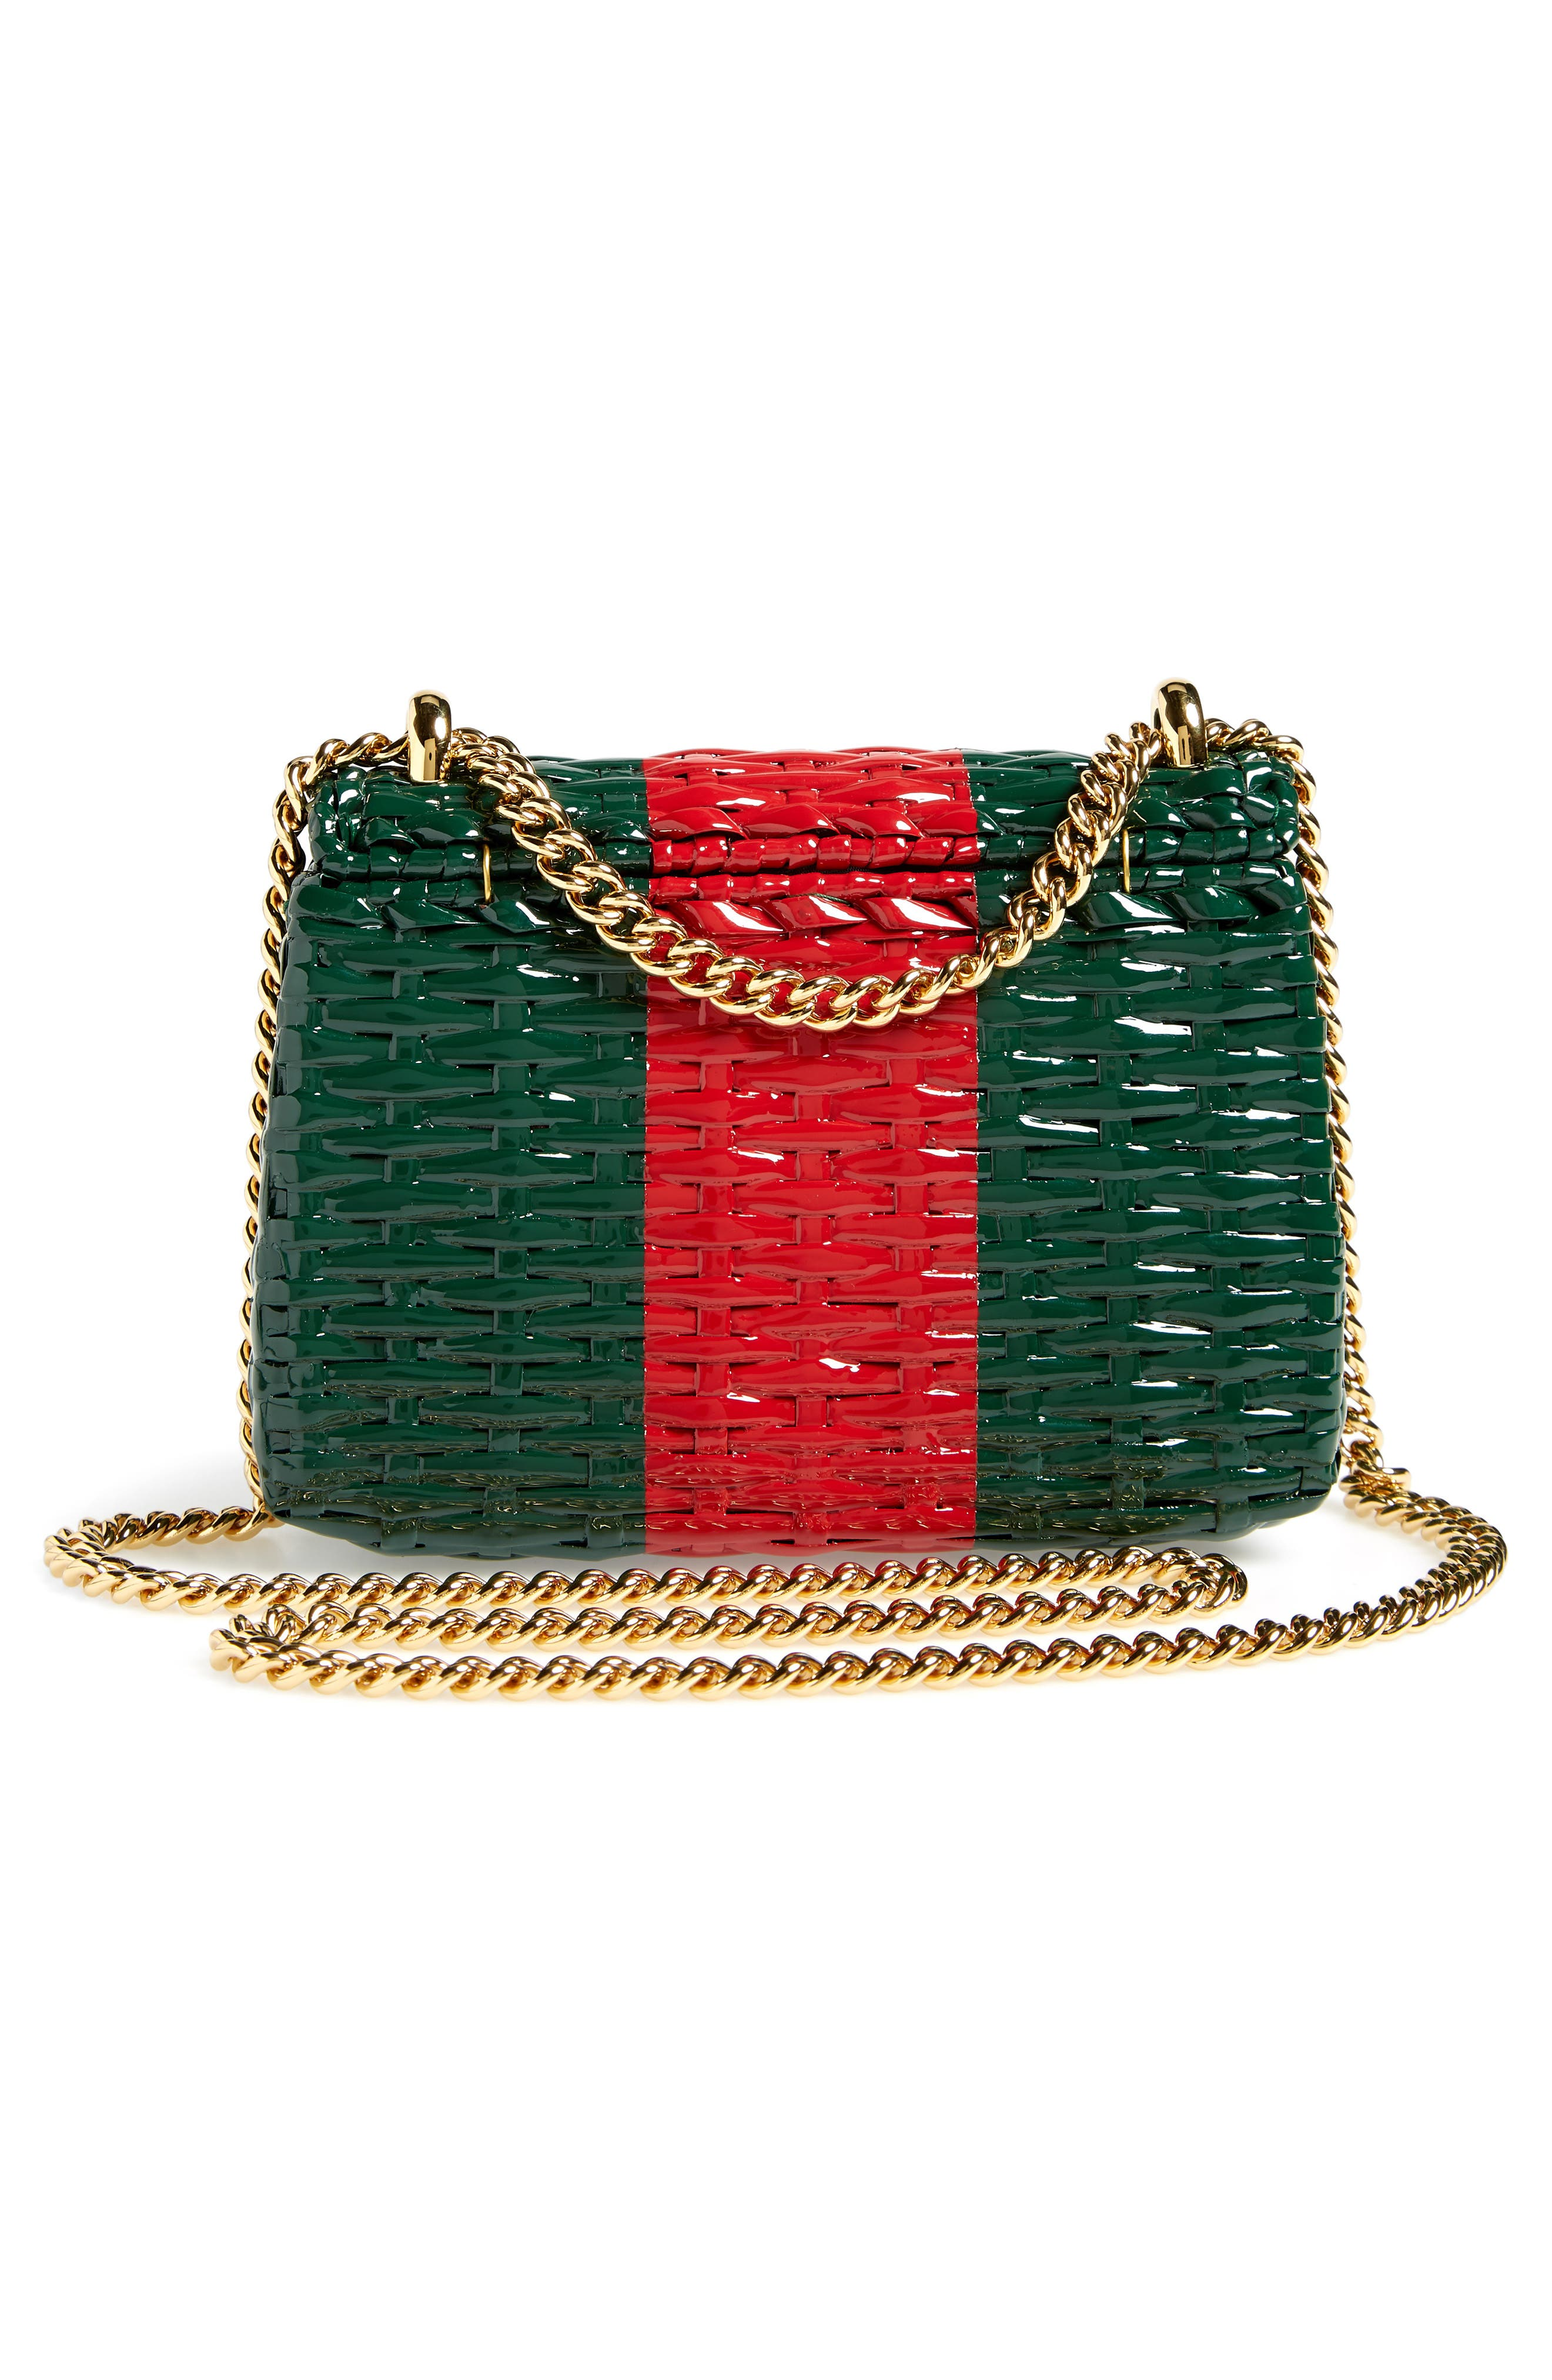 Small Linea Cestino Glazed Wicker Shoulder Bag,                             Alternate thumbnail 3, color,                             VERDE ROSSO VERDE